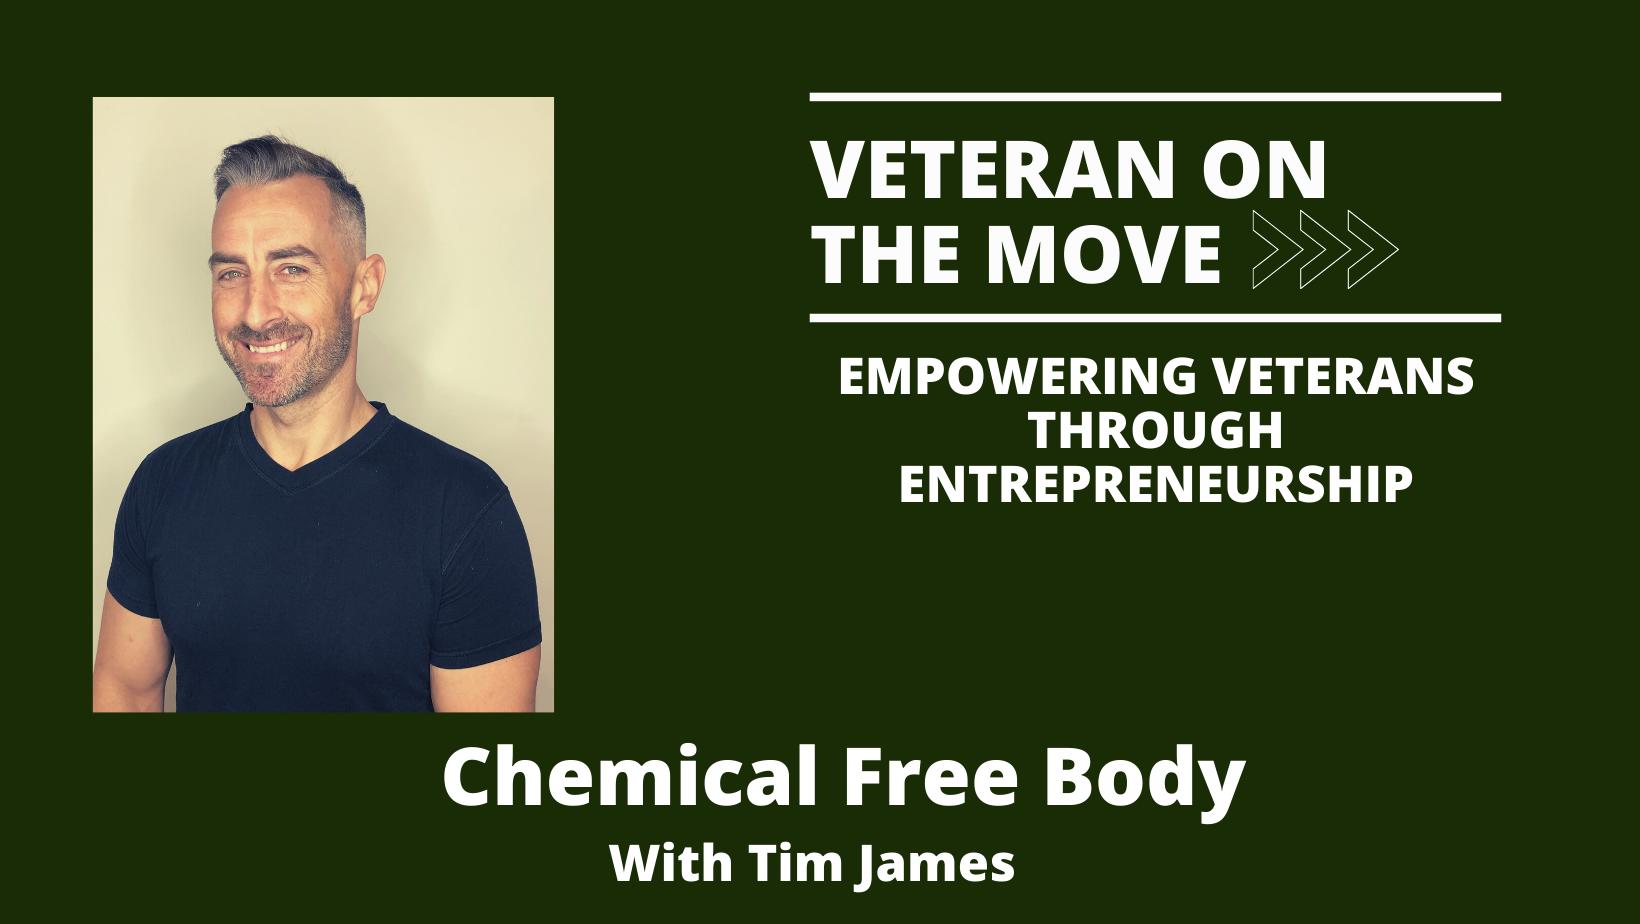 Tim James, Veteran On The Move